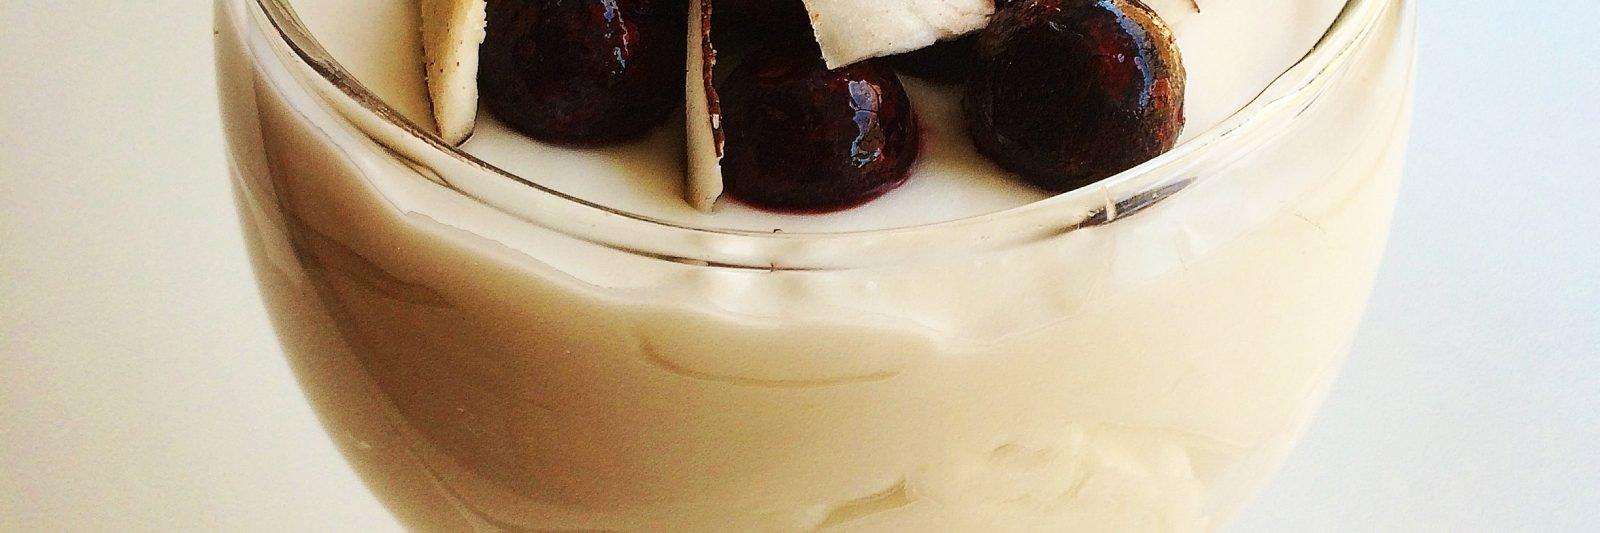 coconut-milk-yogurt